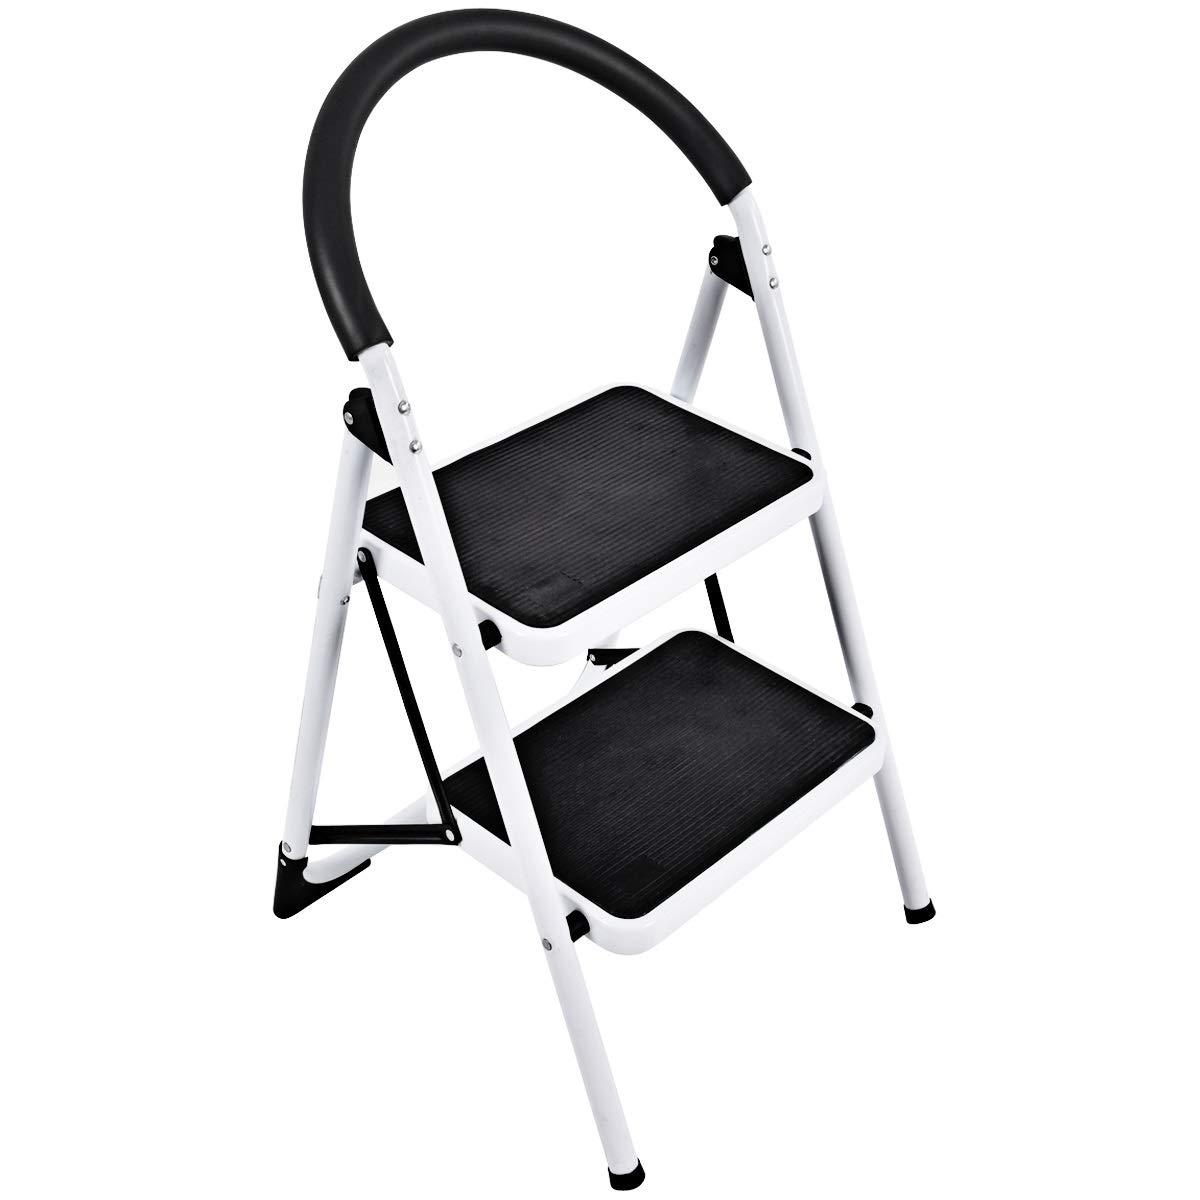 Goplus Step Ladder, Heavy Duty Folding 2 Step Ladder Step Stool with Handgrip and Wide Anti-Slip Platform Sturdy HD Construction, 330lbs Capacity